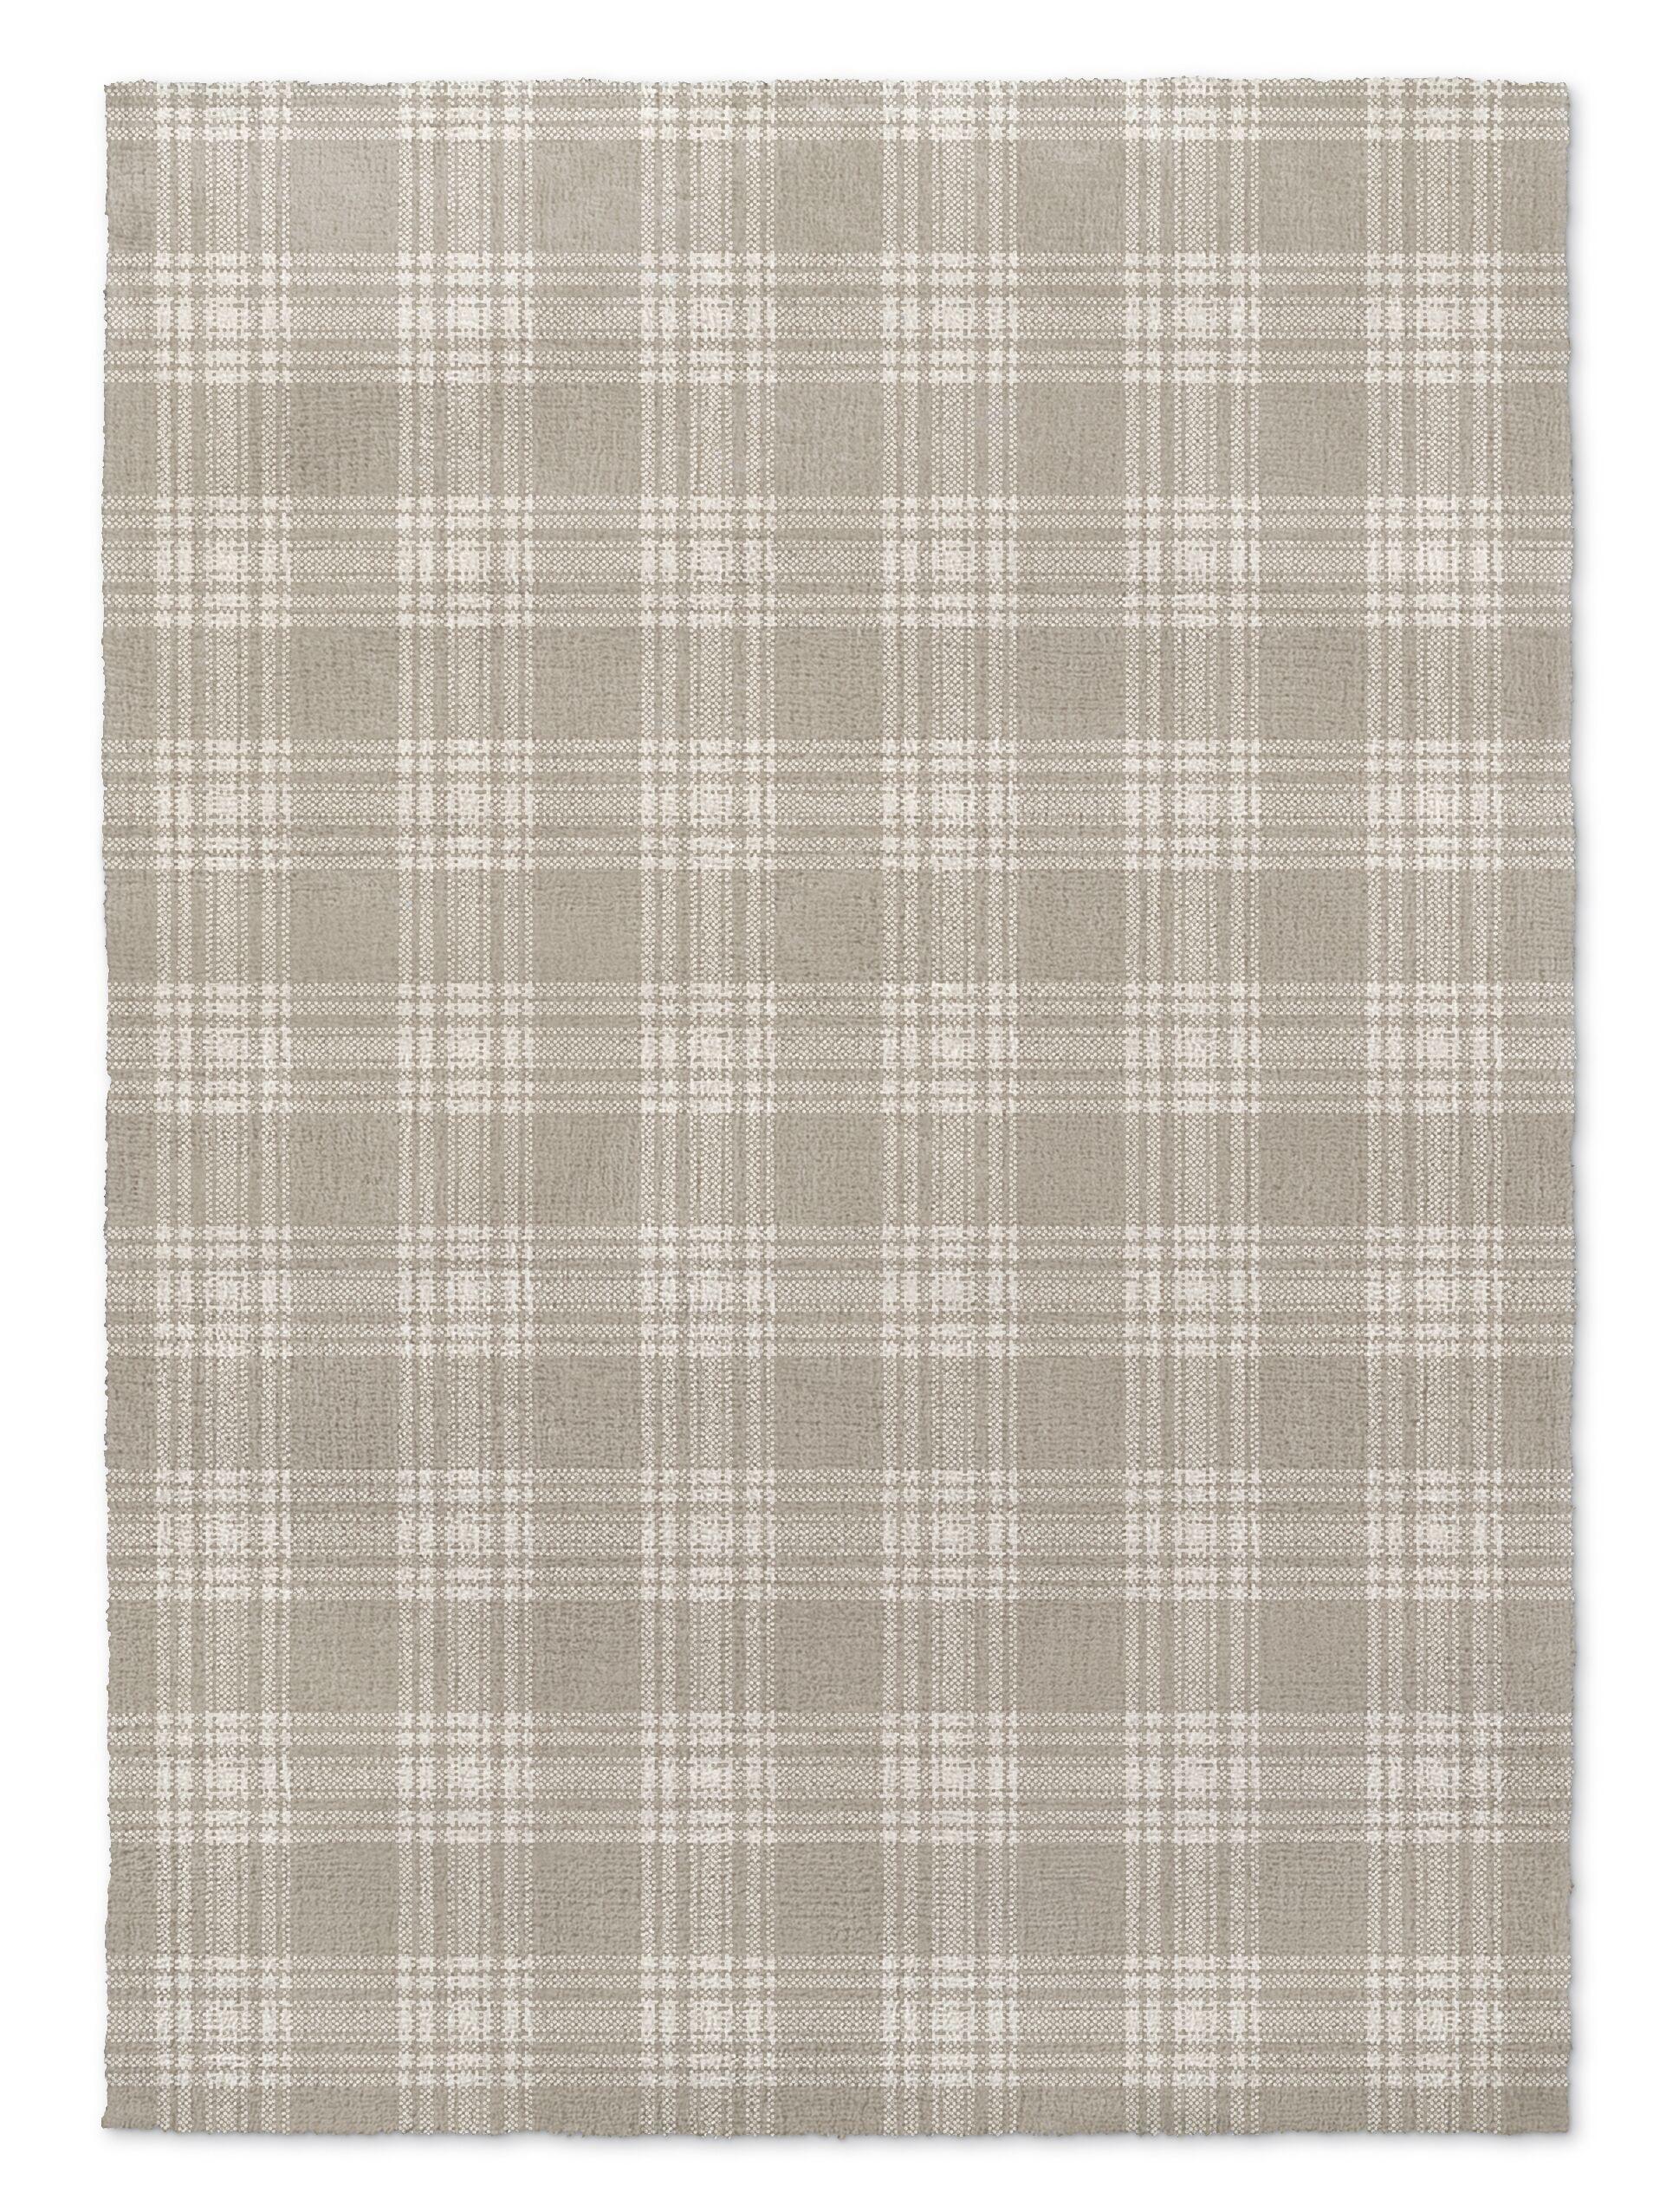 Montalvo Light Tan Area Rug Rug Size: Rectangle 2' x 3'